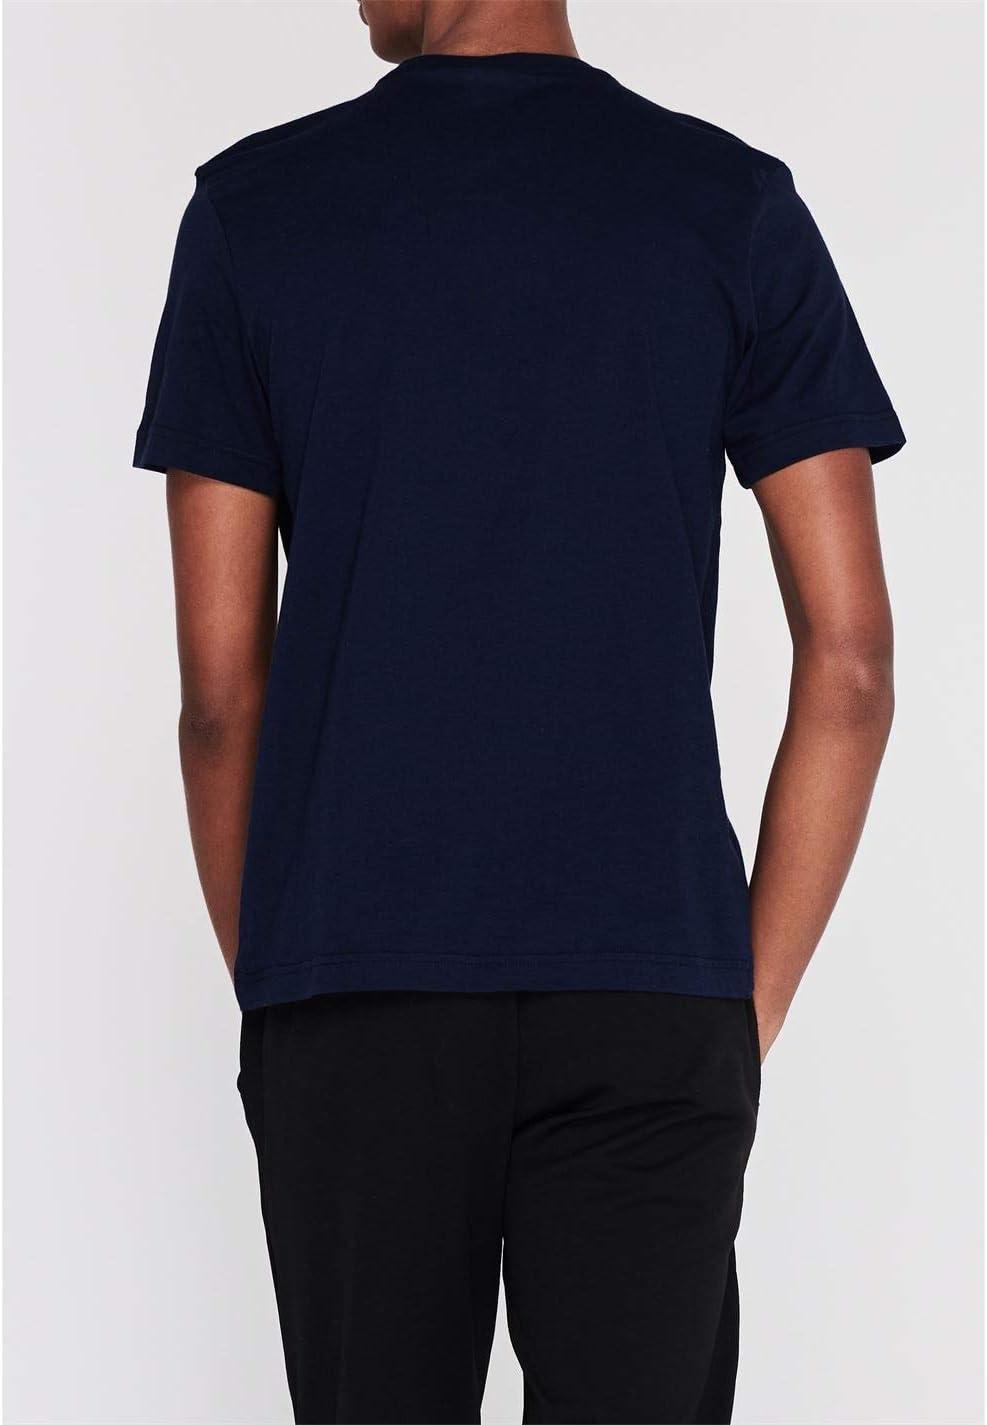 Hombre Reebok GS Stacked tee Camiseta